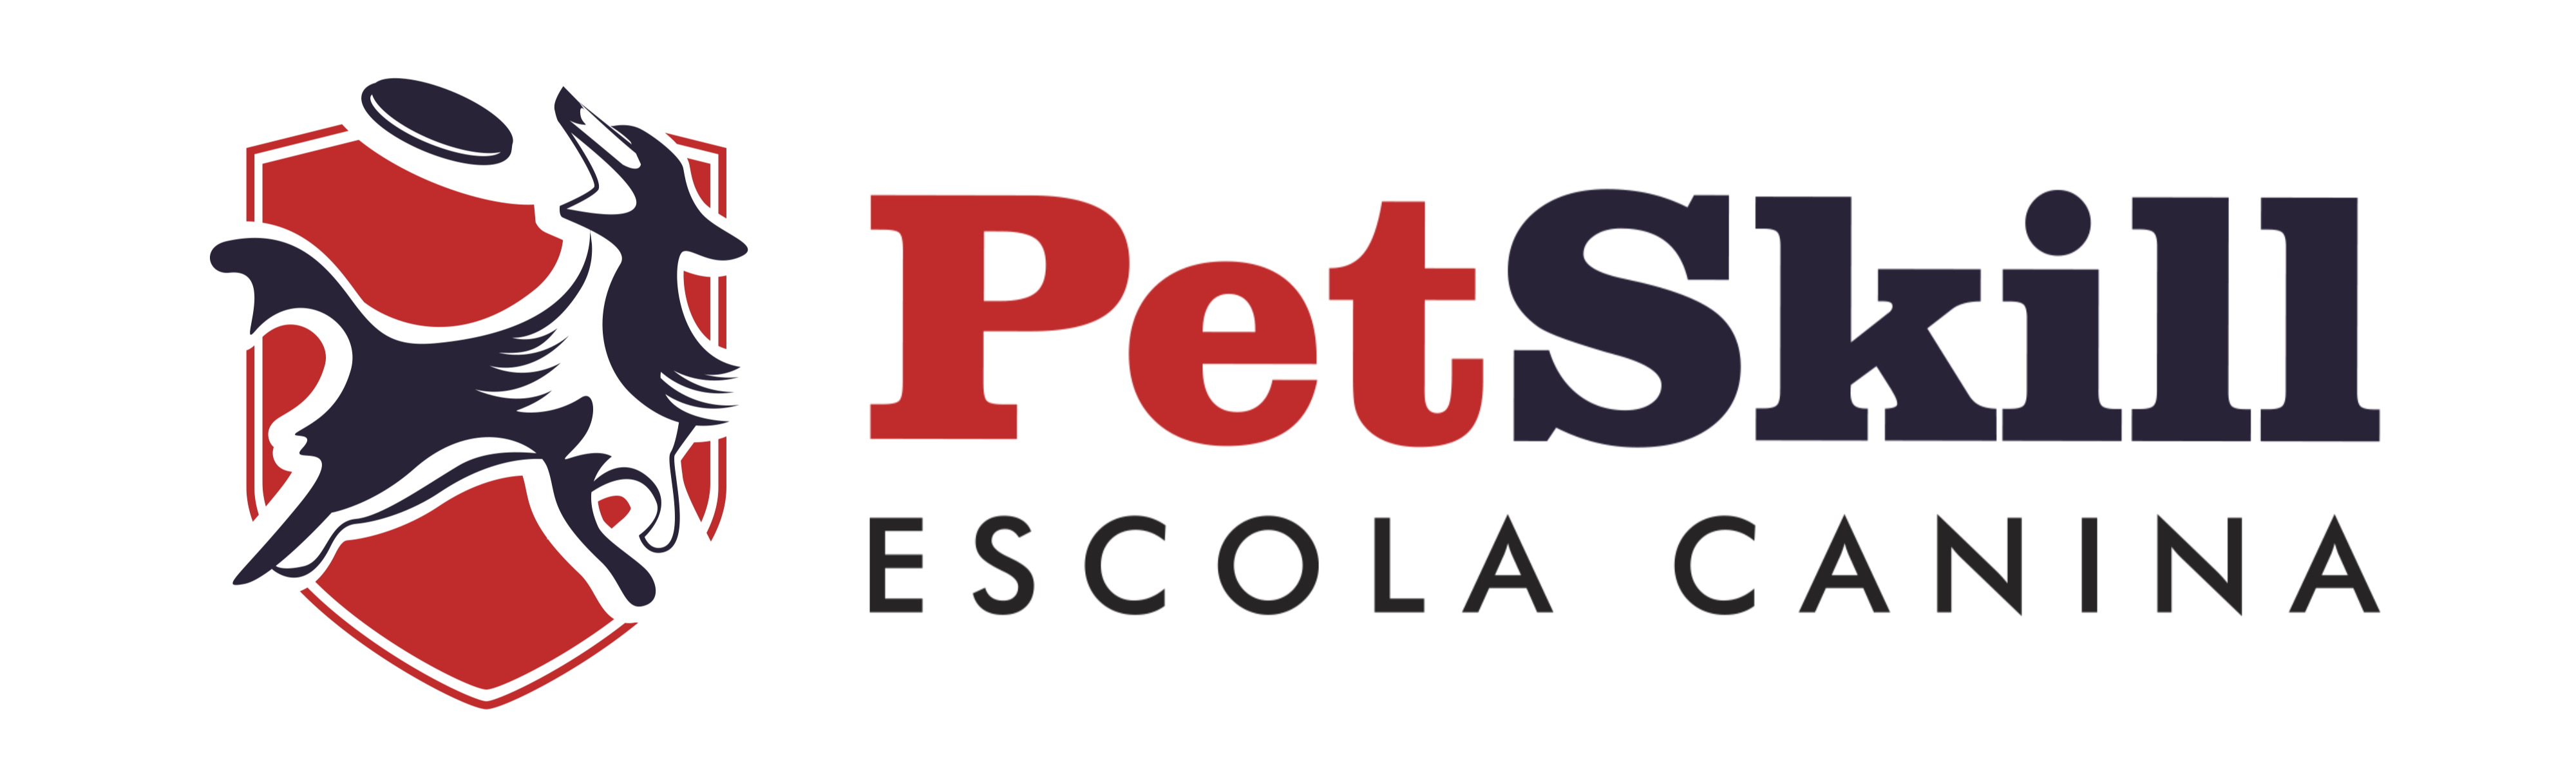 PETSKILL ESCOLA-CANINA